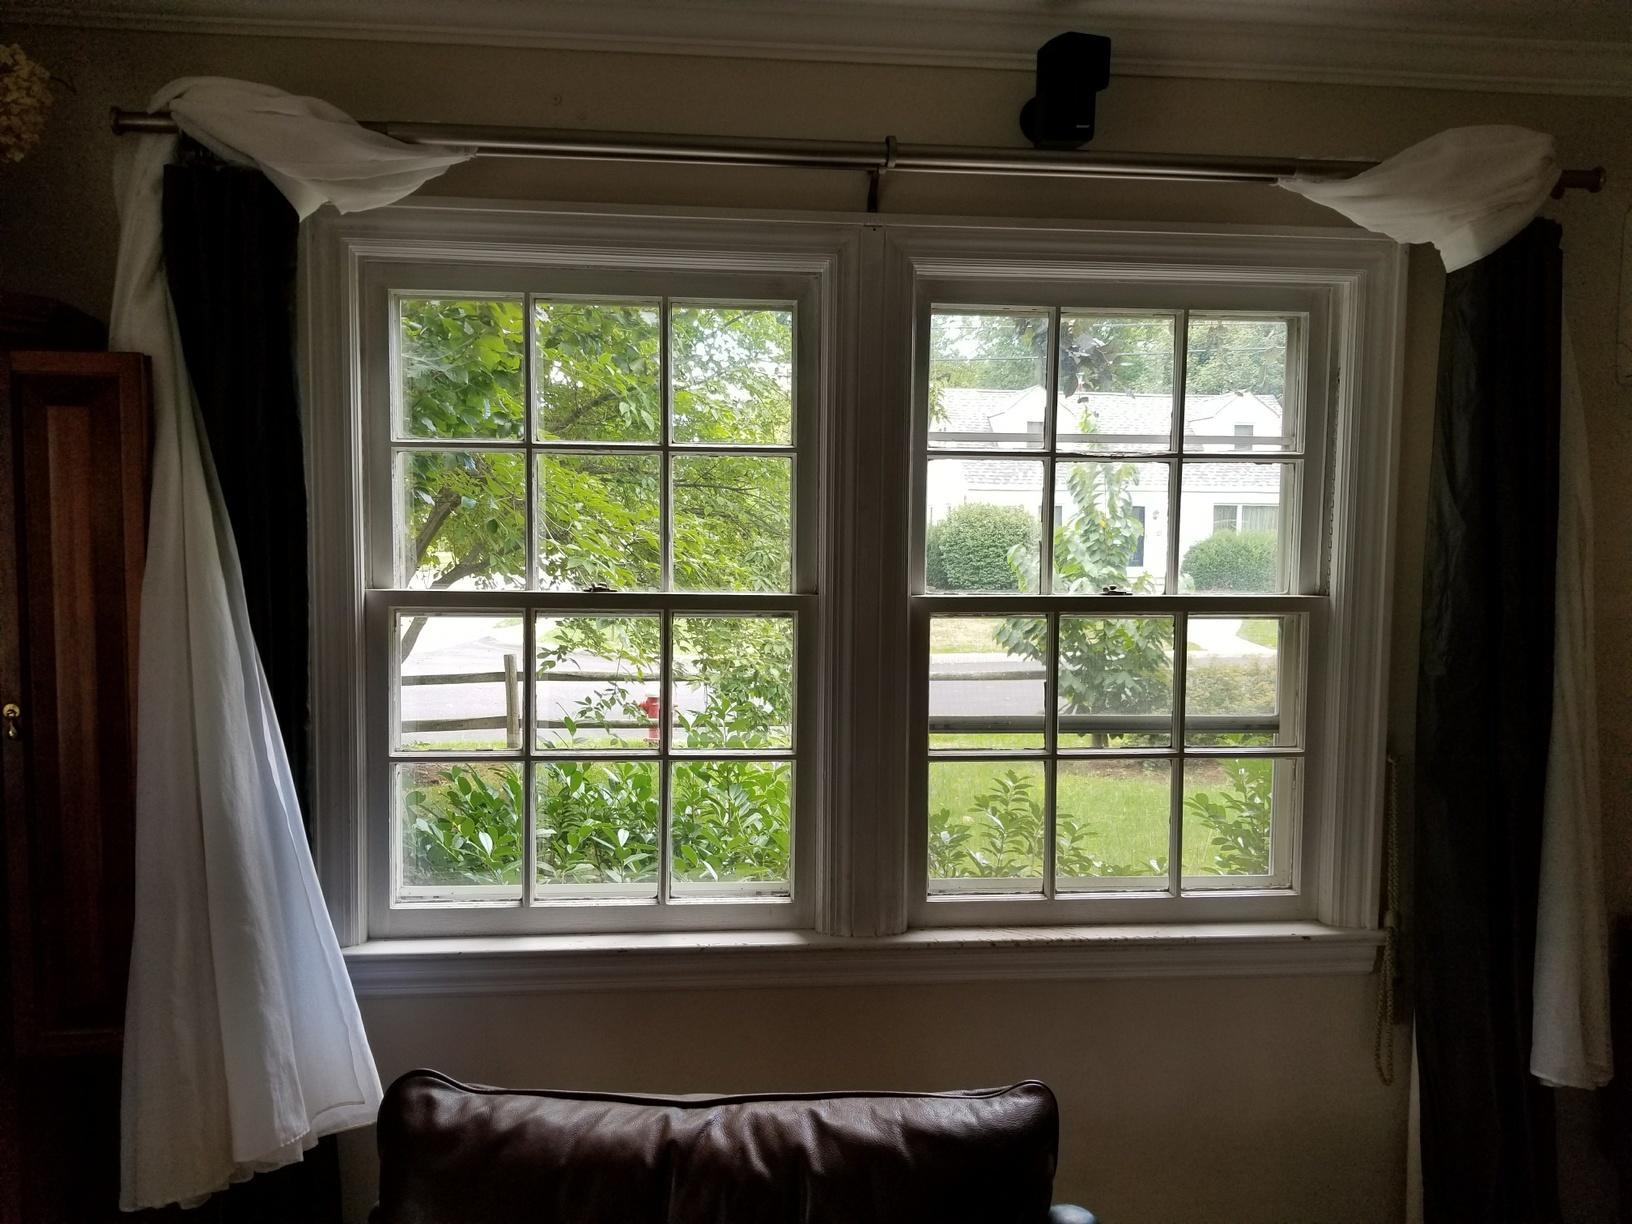 Replacing Drafty Windows in Tenafly, NJ